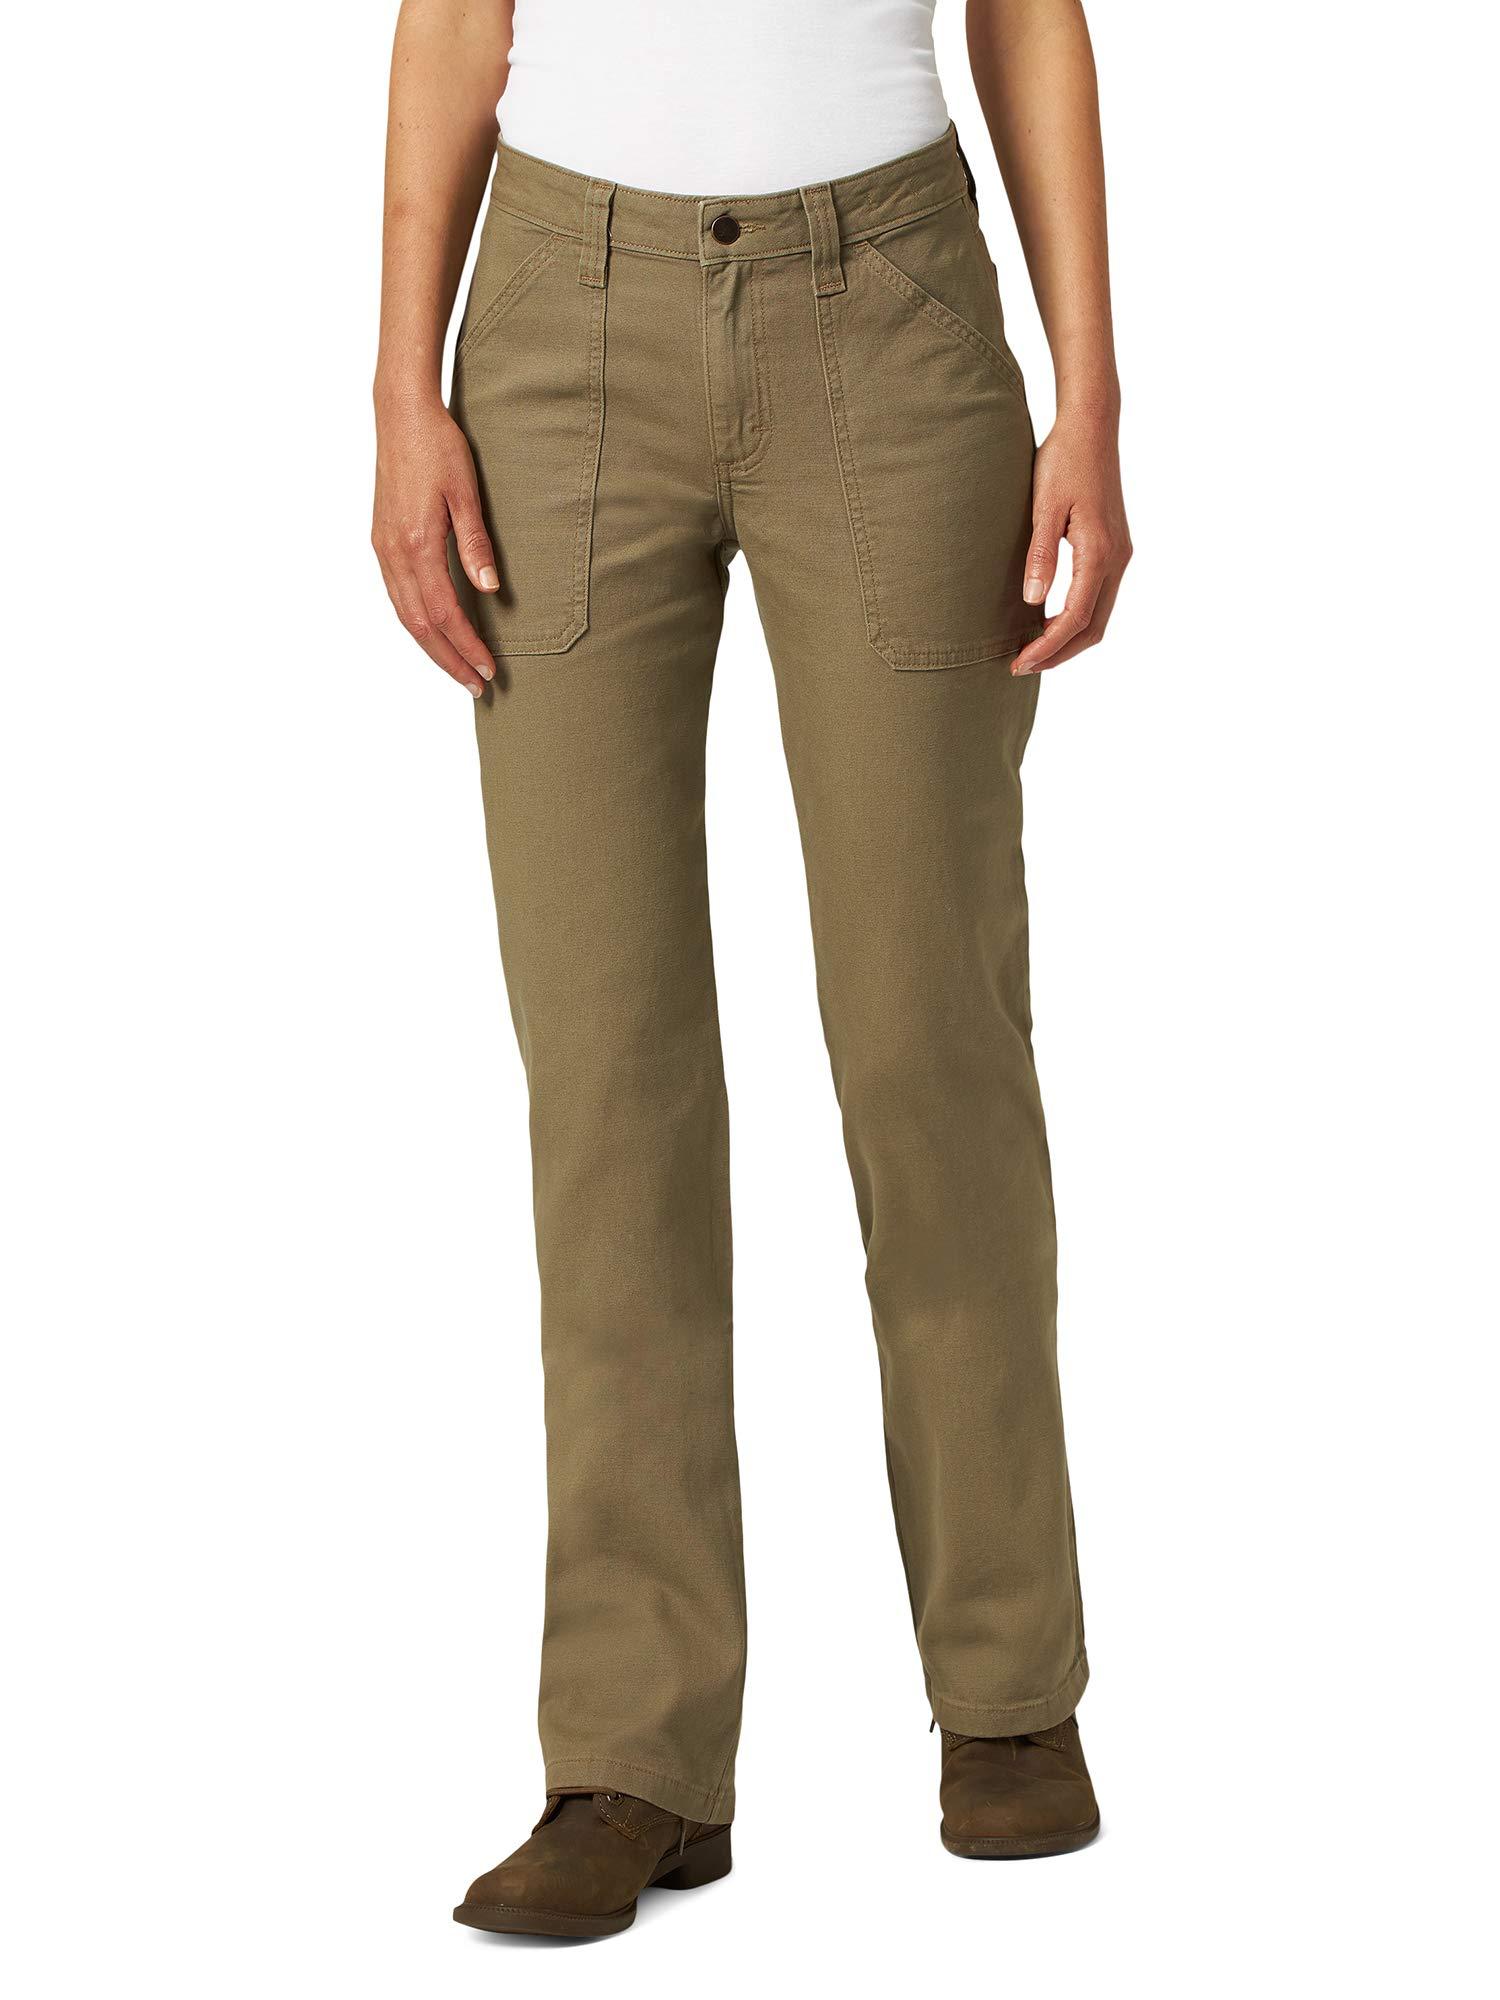 Wrangler Riggs Workwear Women's Advanced Comfort Regular Fit Work Pant